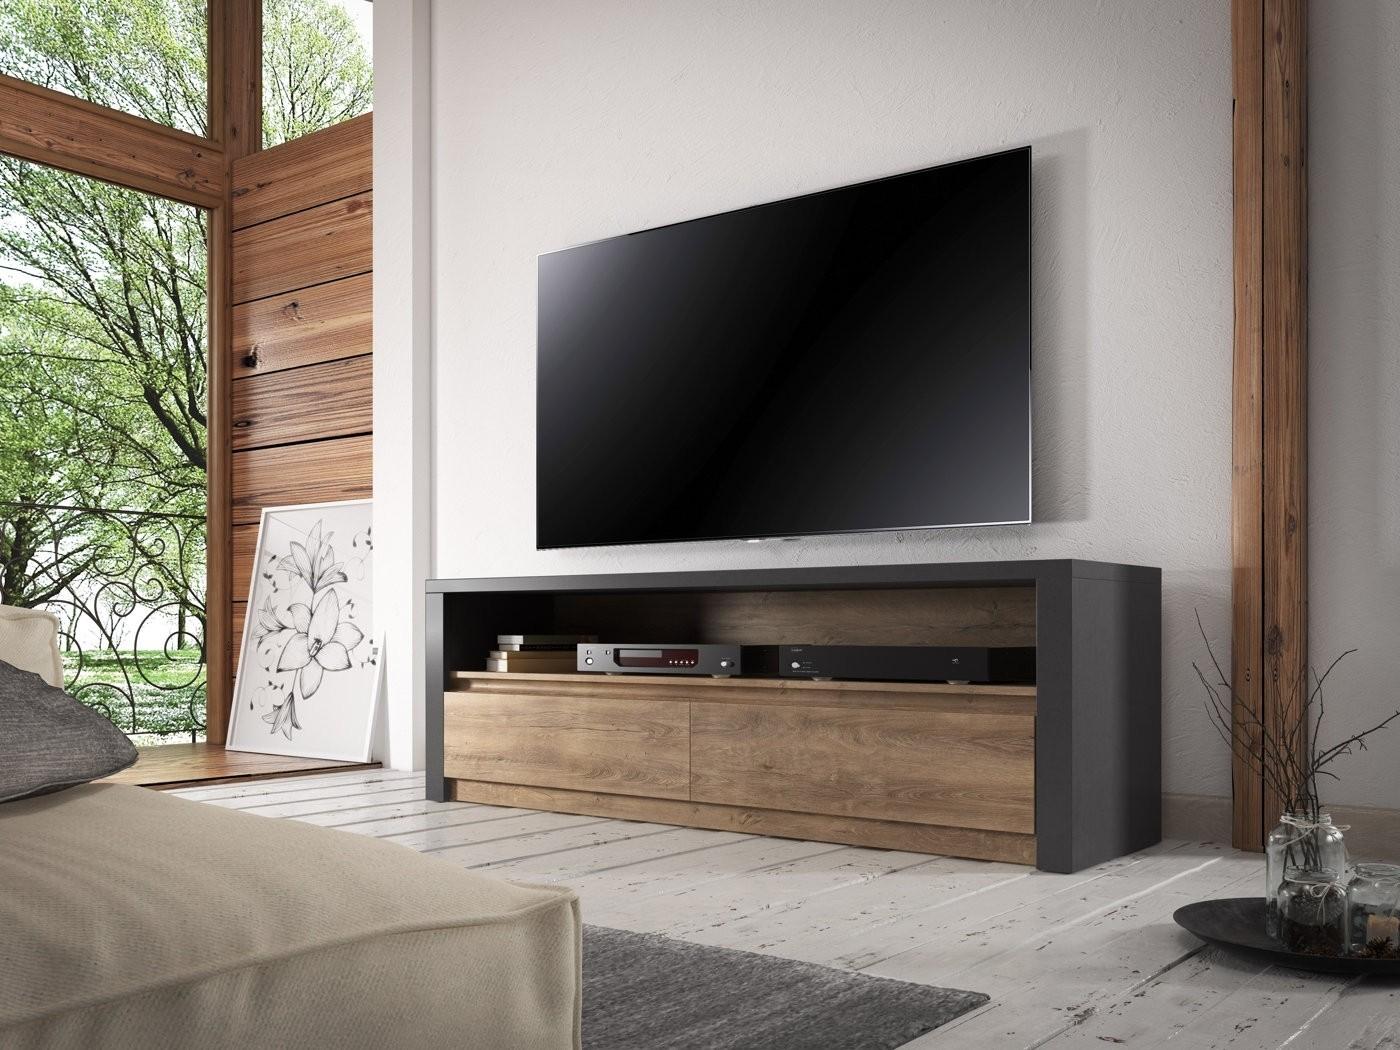 Tv Meubel Design.Tv Meubel Monaco Eiken Grijs 130 Cm Meubella